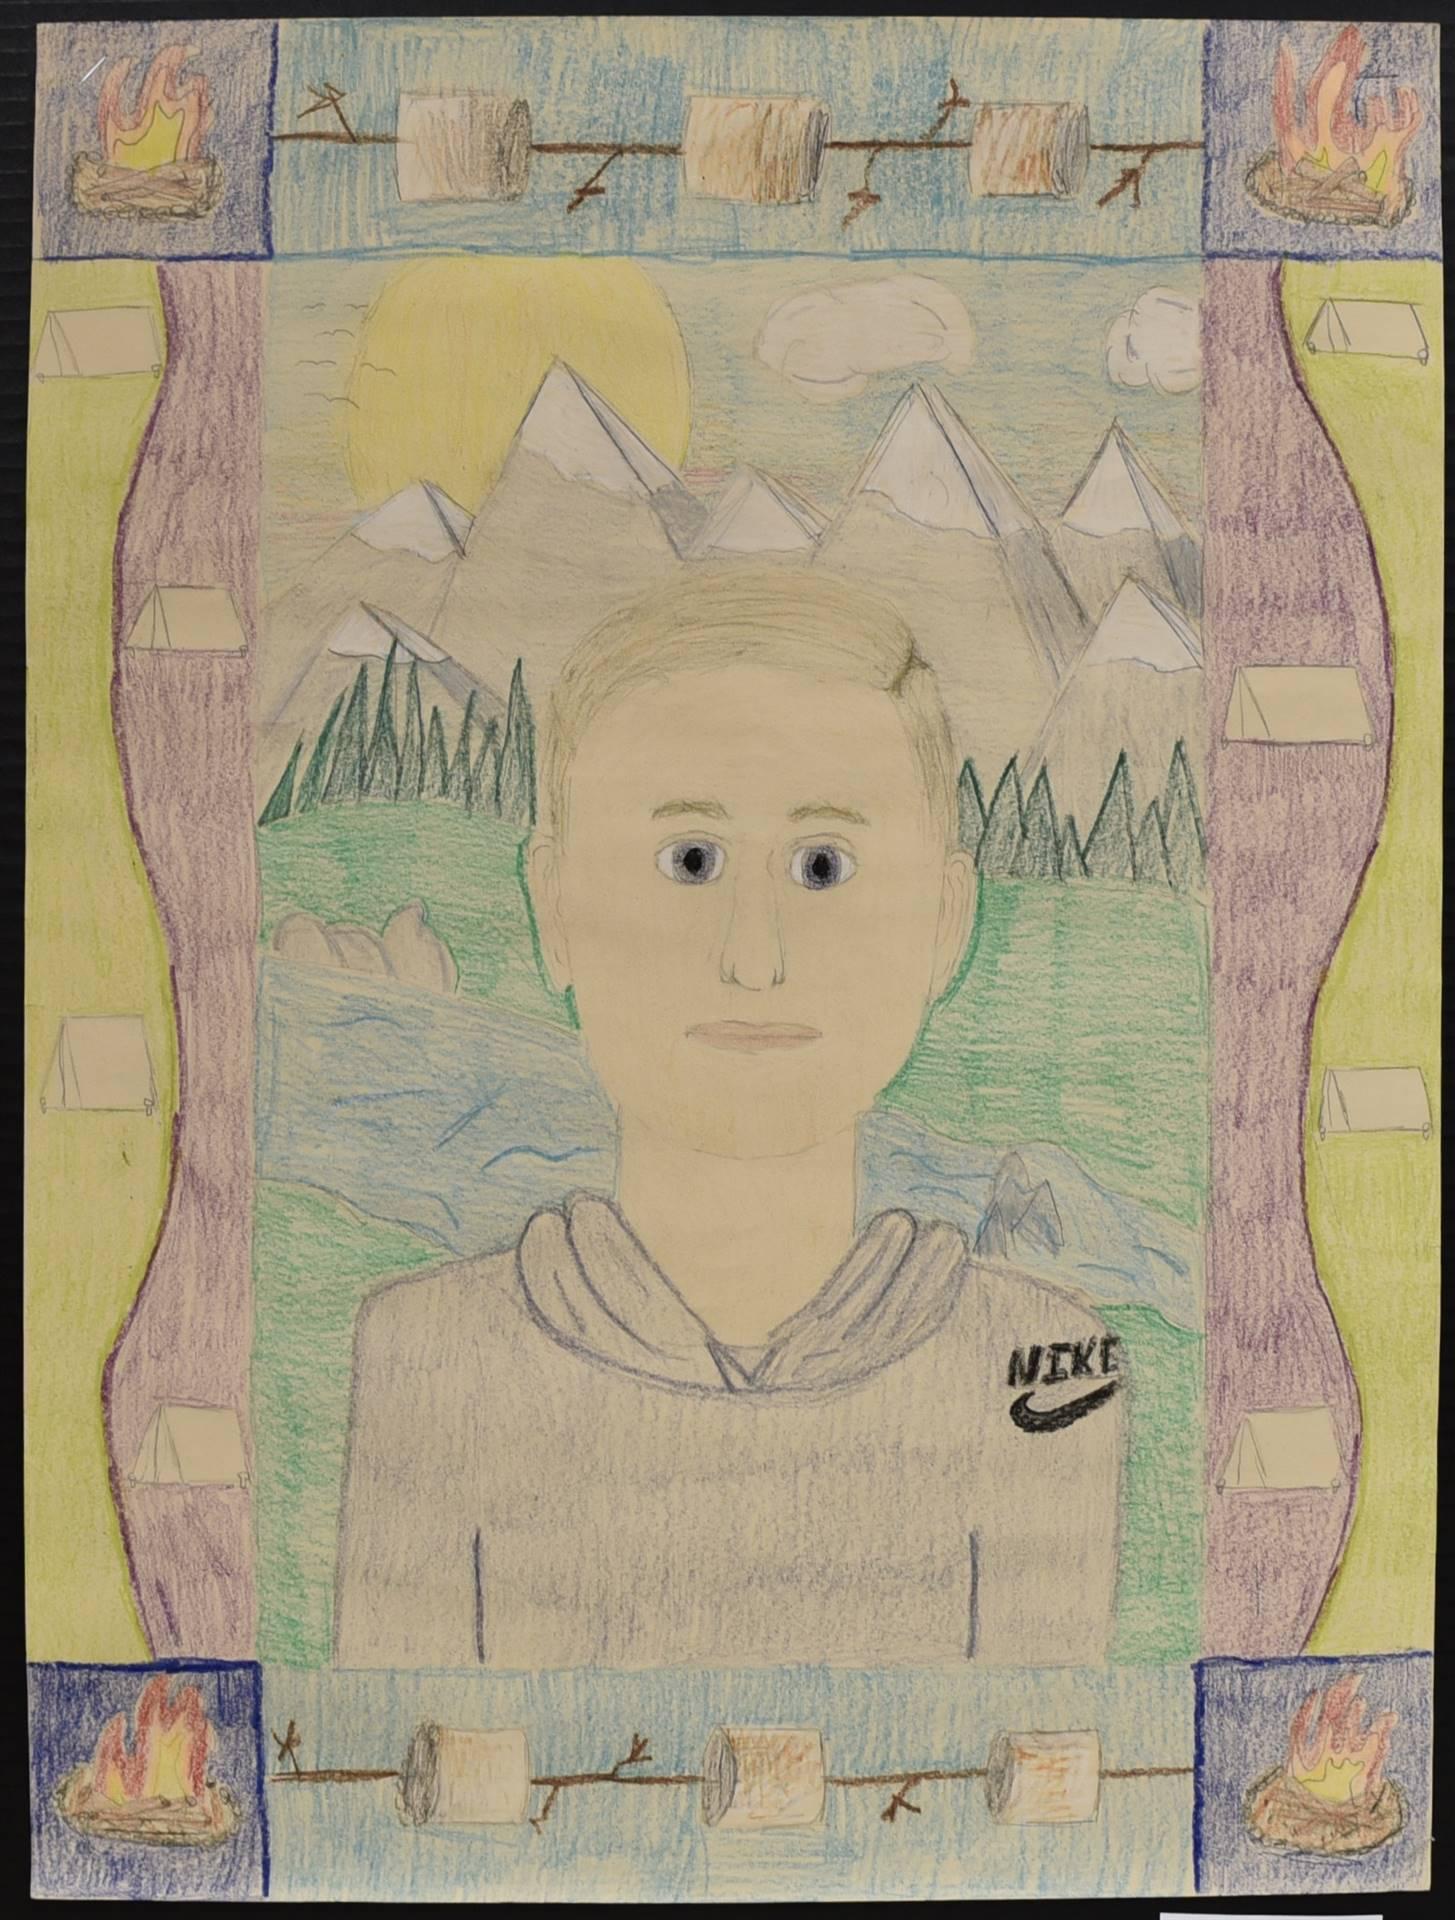 Brecksville-Broadview Hts. Middle School Art Projects 157